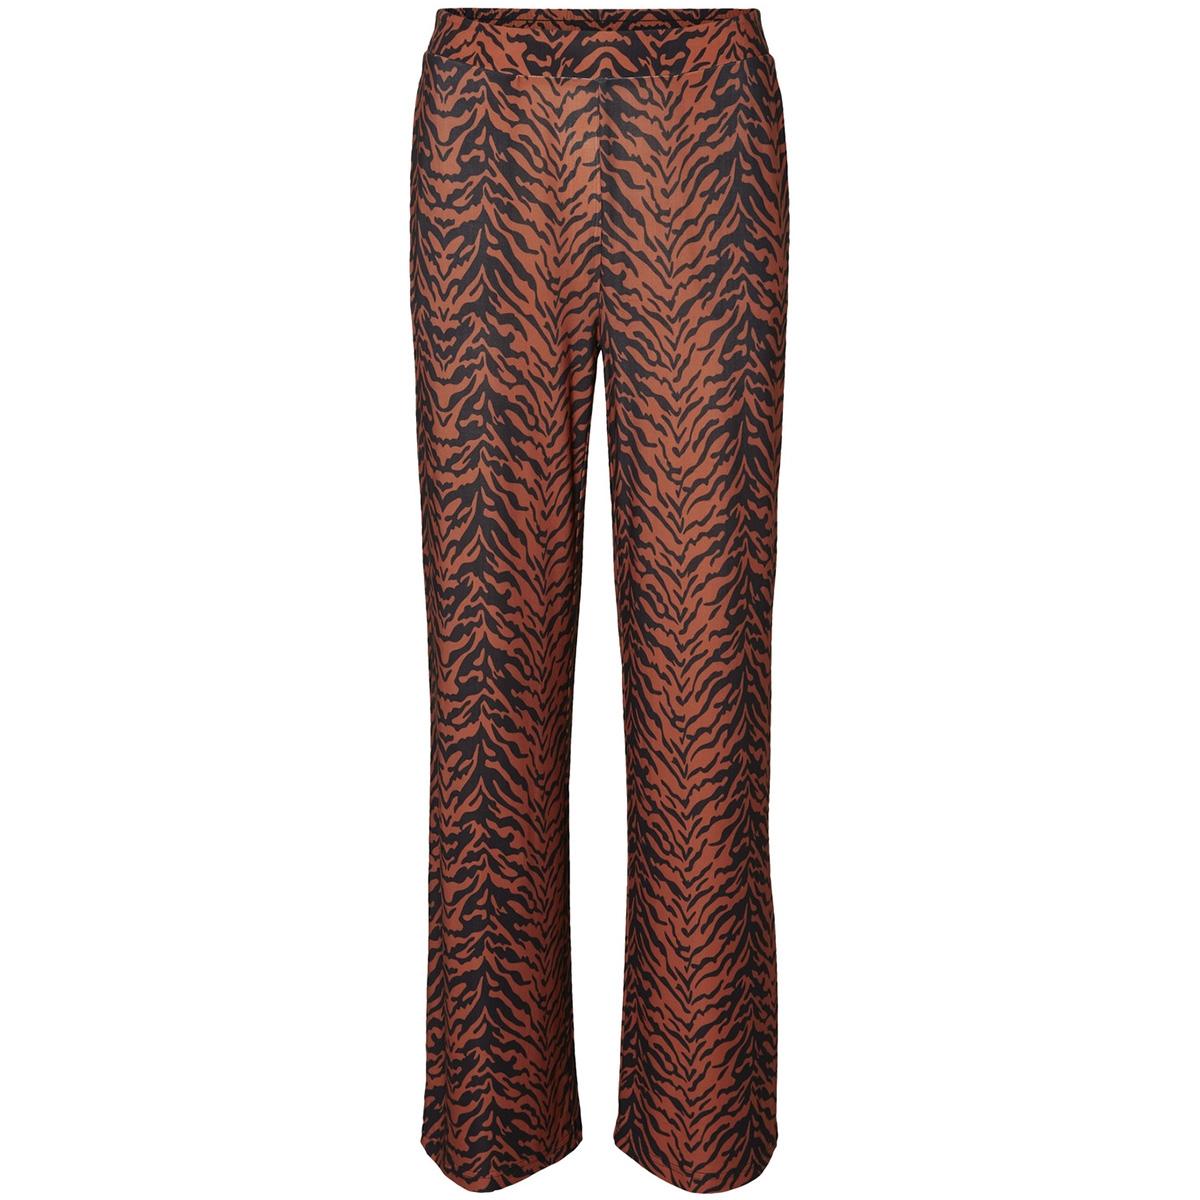 nmsally snake nw loose pant x4 27008005 noisy may broek black/auburn/black